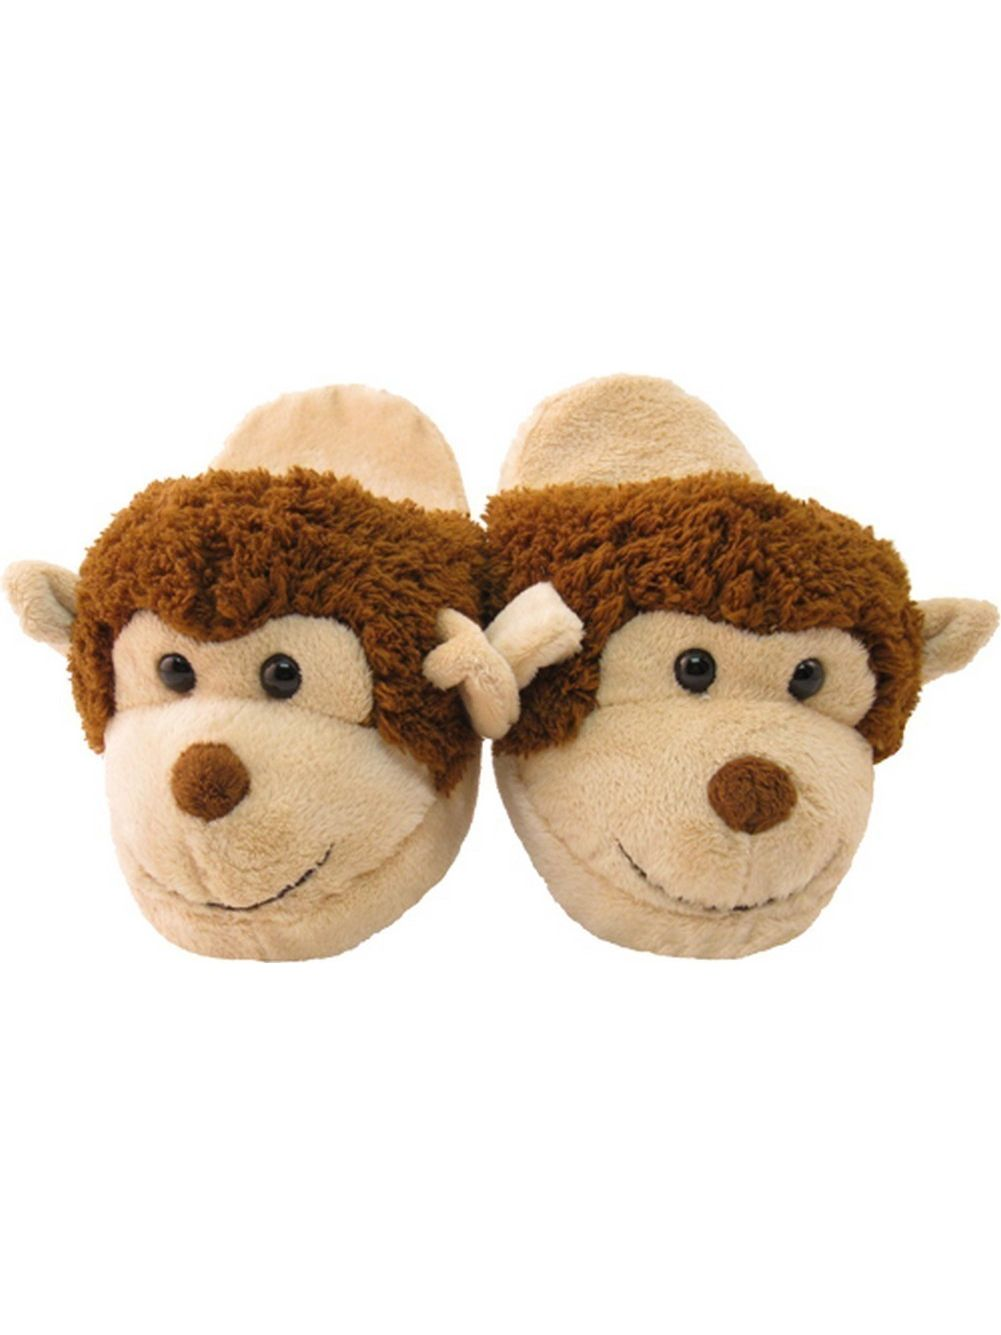 Kreative Unisex Little Kids Brown Tan Monkey Shaped Plush Slippers 12 Kids